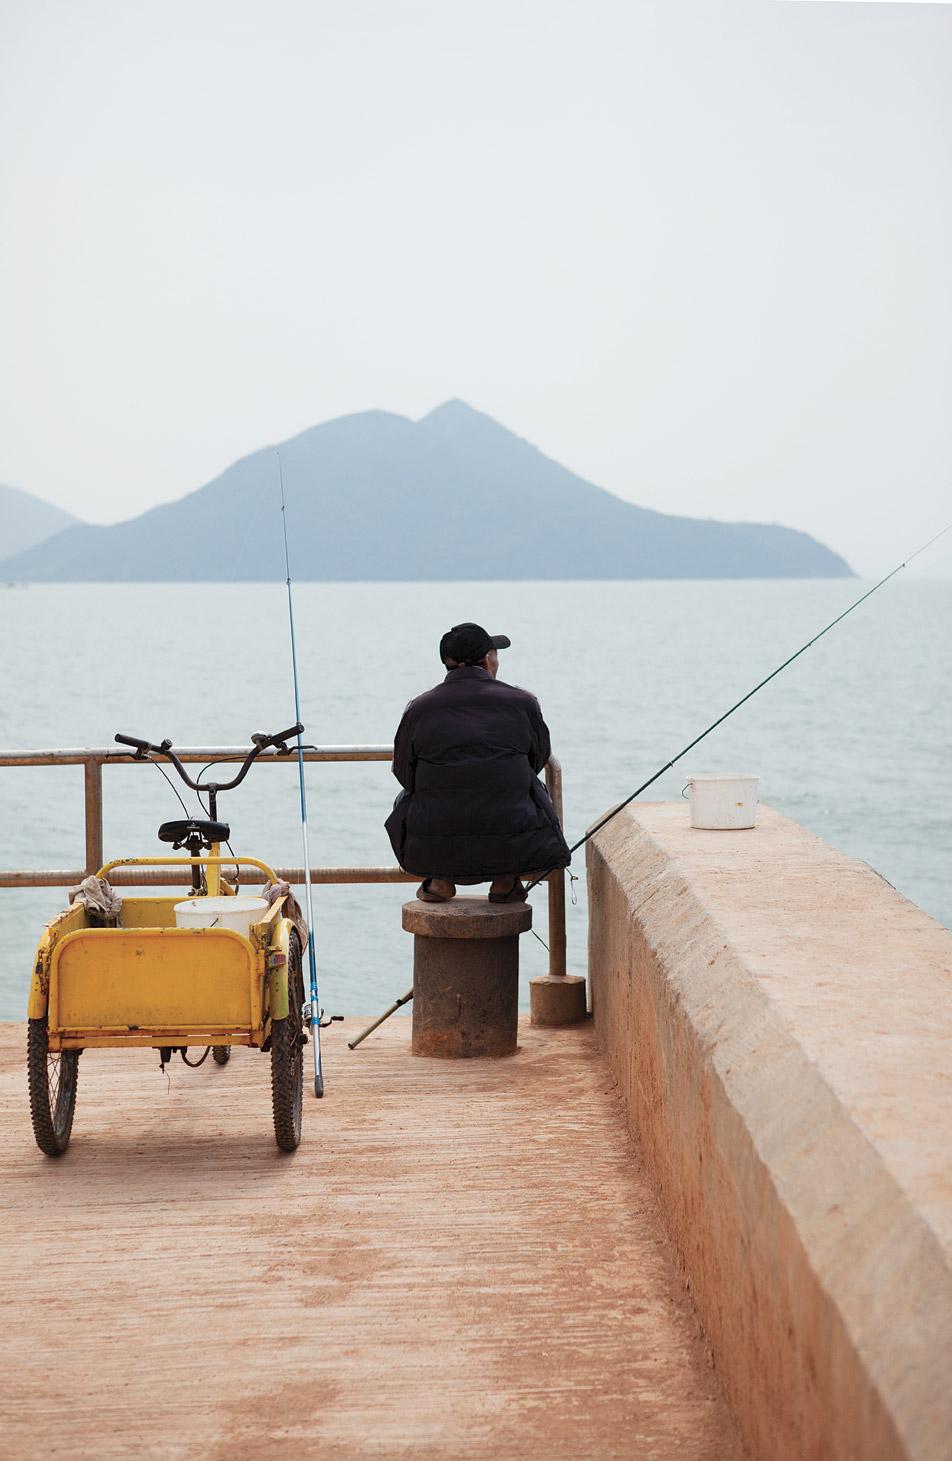 Waiting for a bite on the village's Shek Tsai Po Pier.